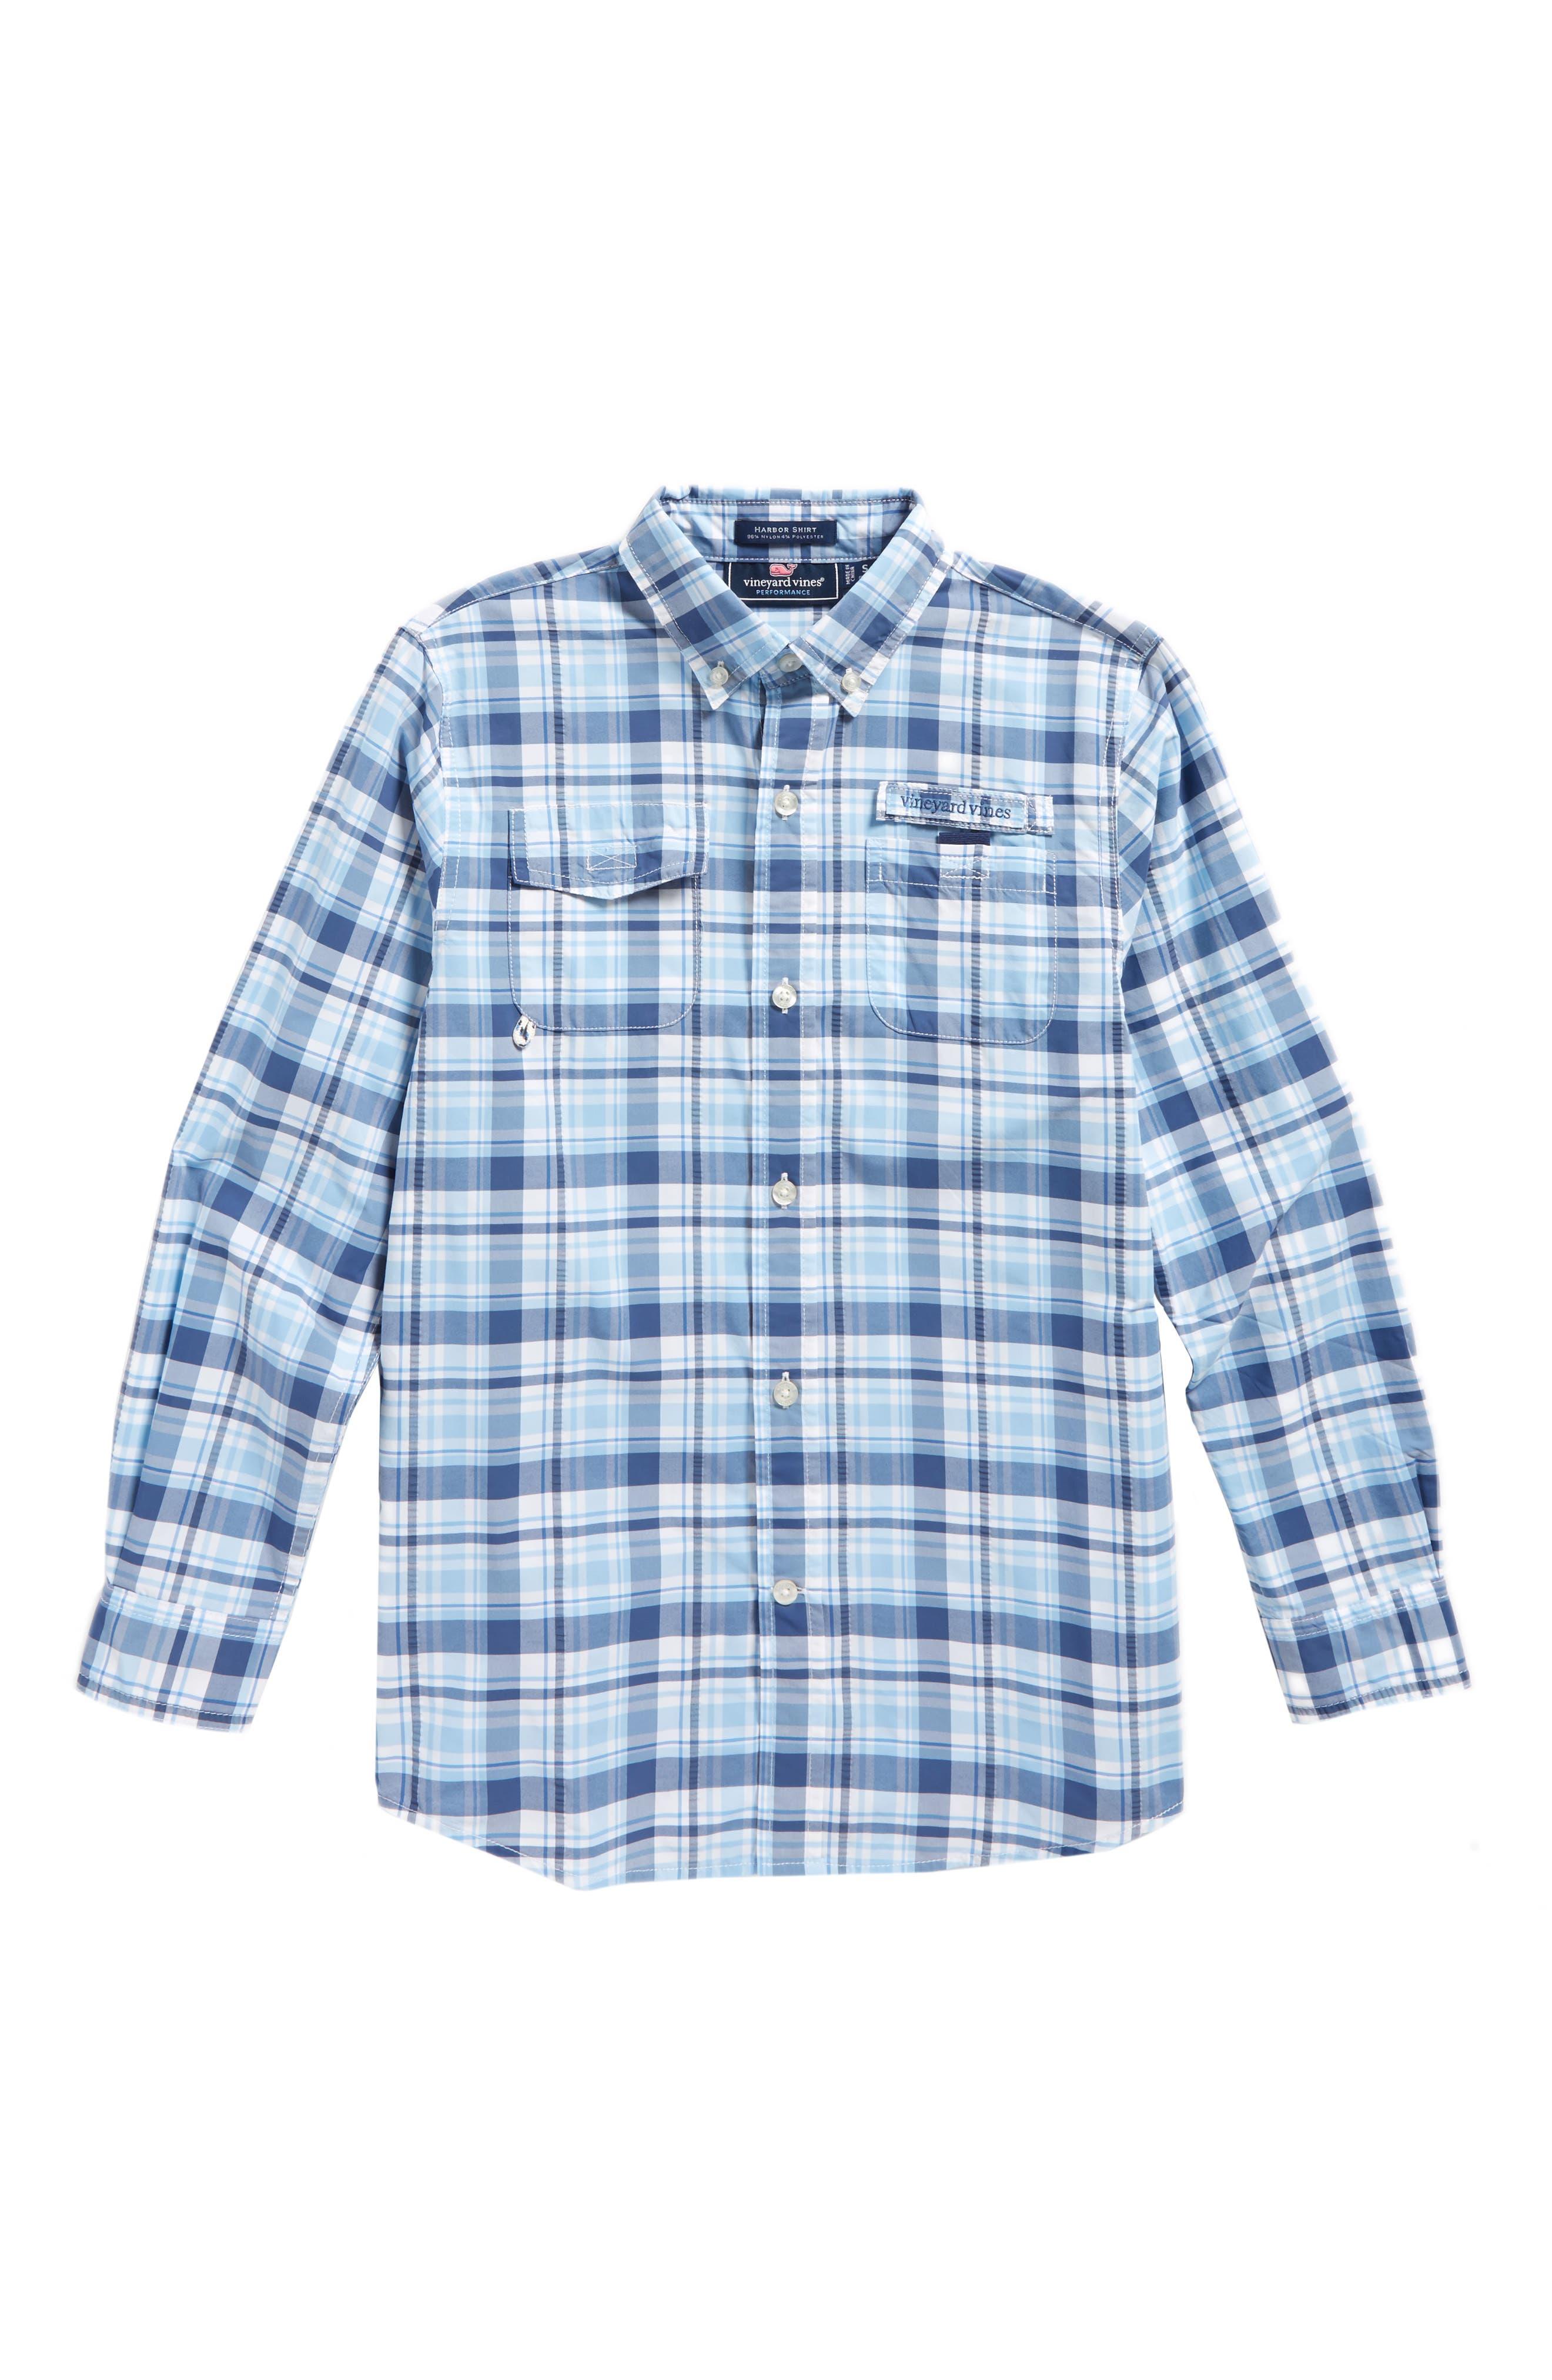 Harbor Plaid Shirt,                             Main thumbnail 1, color,